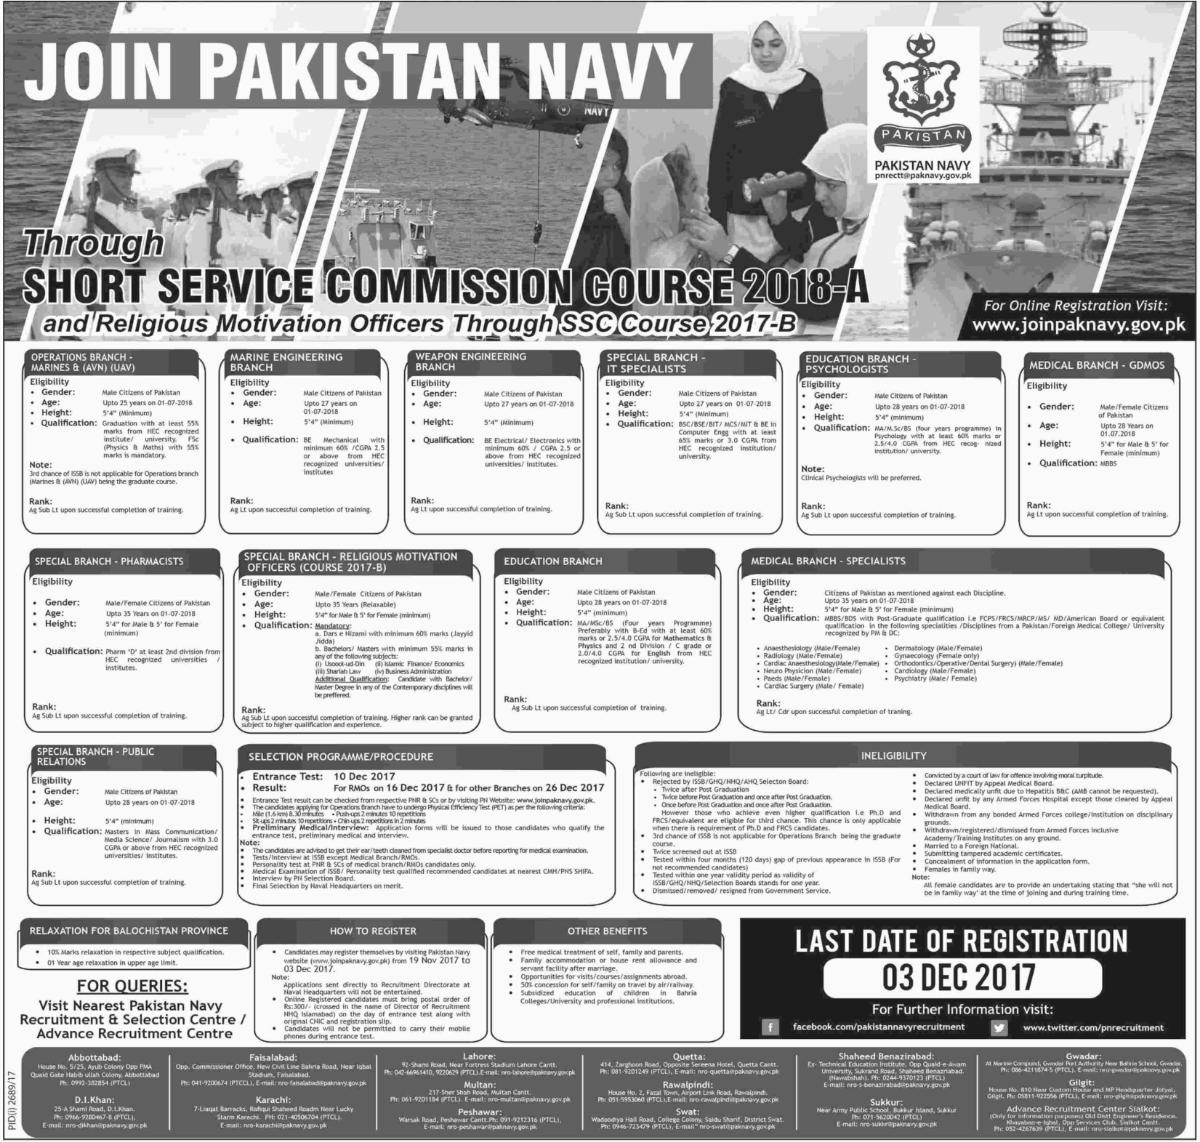 Pakistan NAVY Join Short Service Commission Course 2018 A